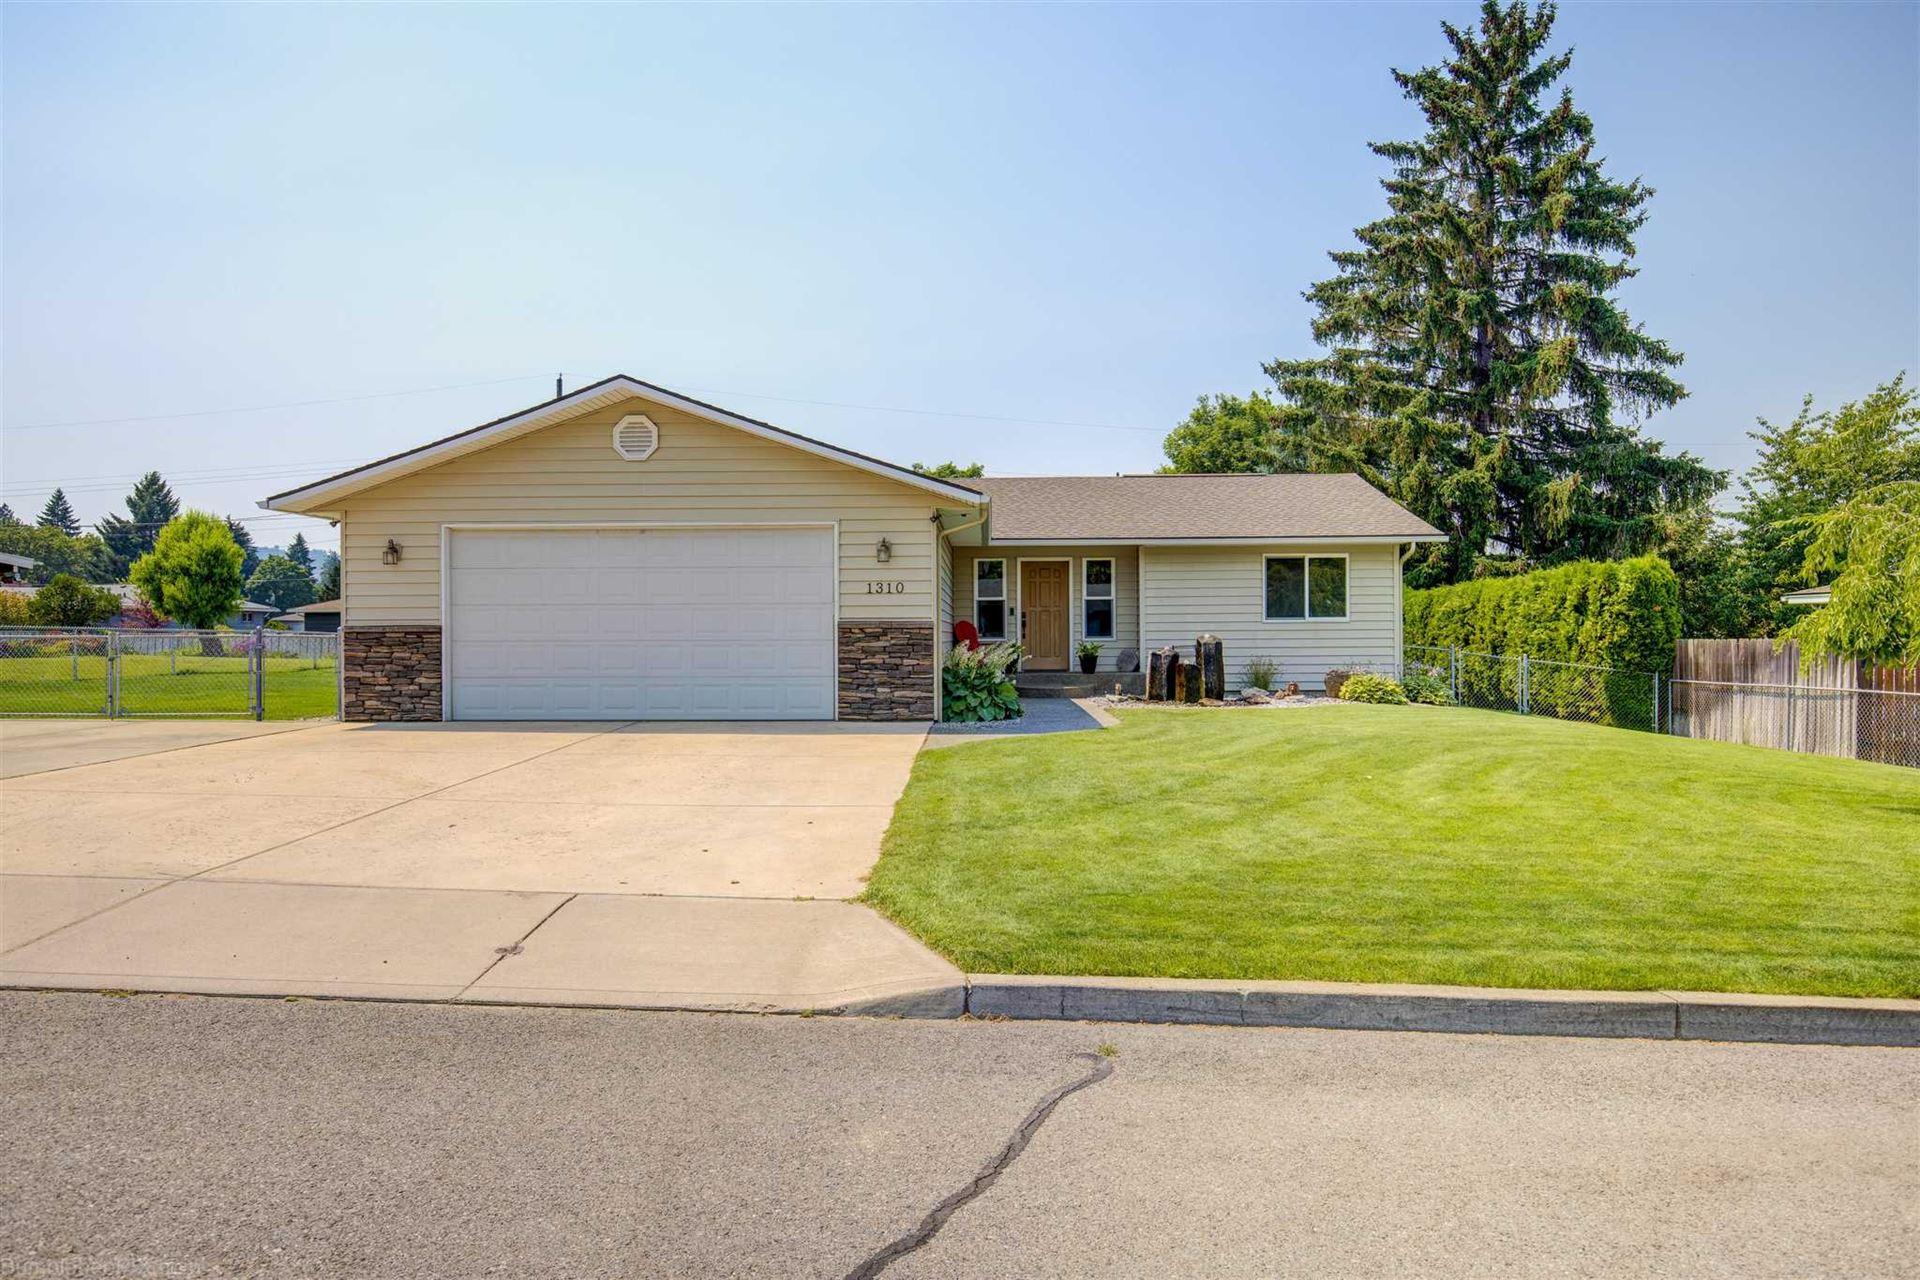 1310 S Fox Rd, Spokane Valley, WA 99206 - #: 202119019